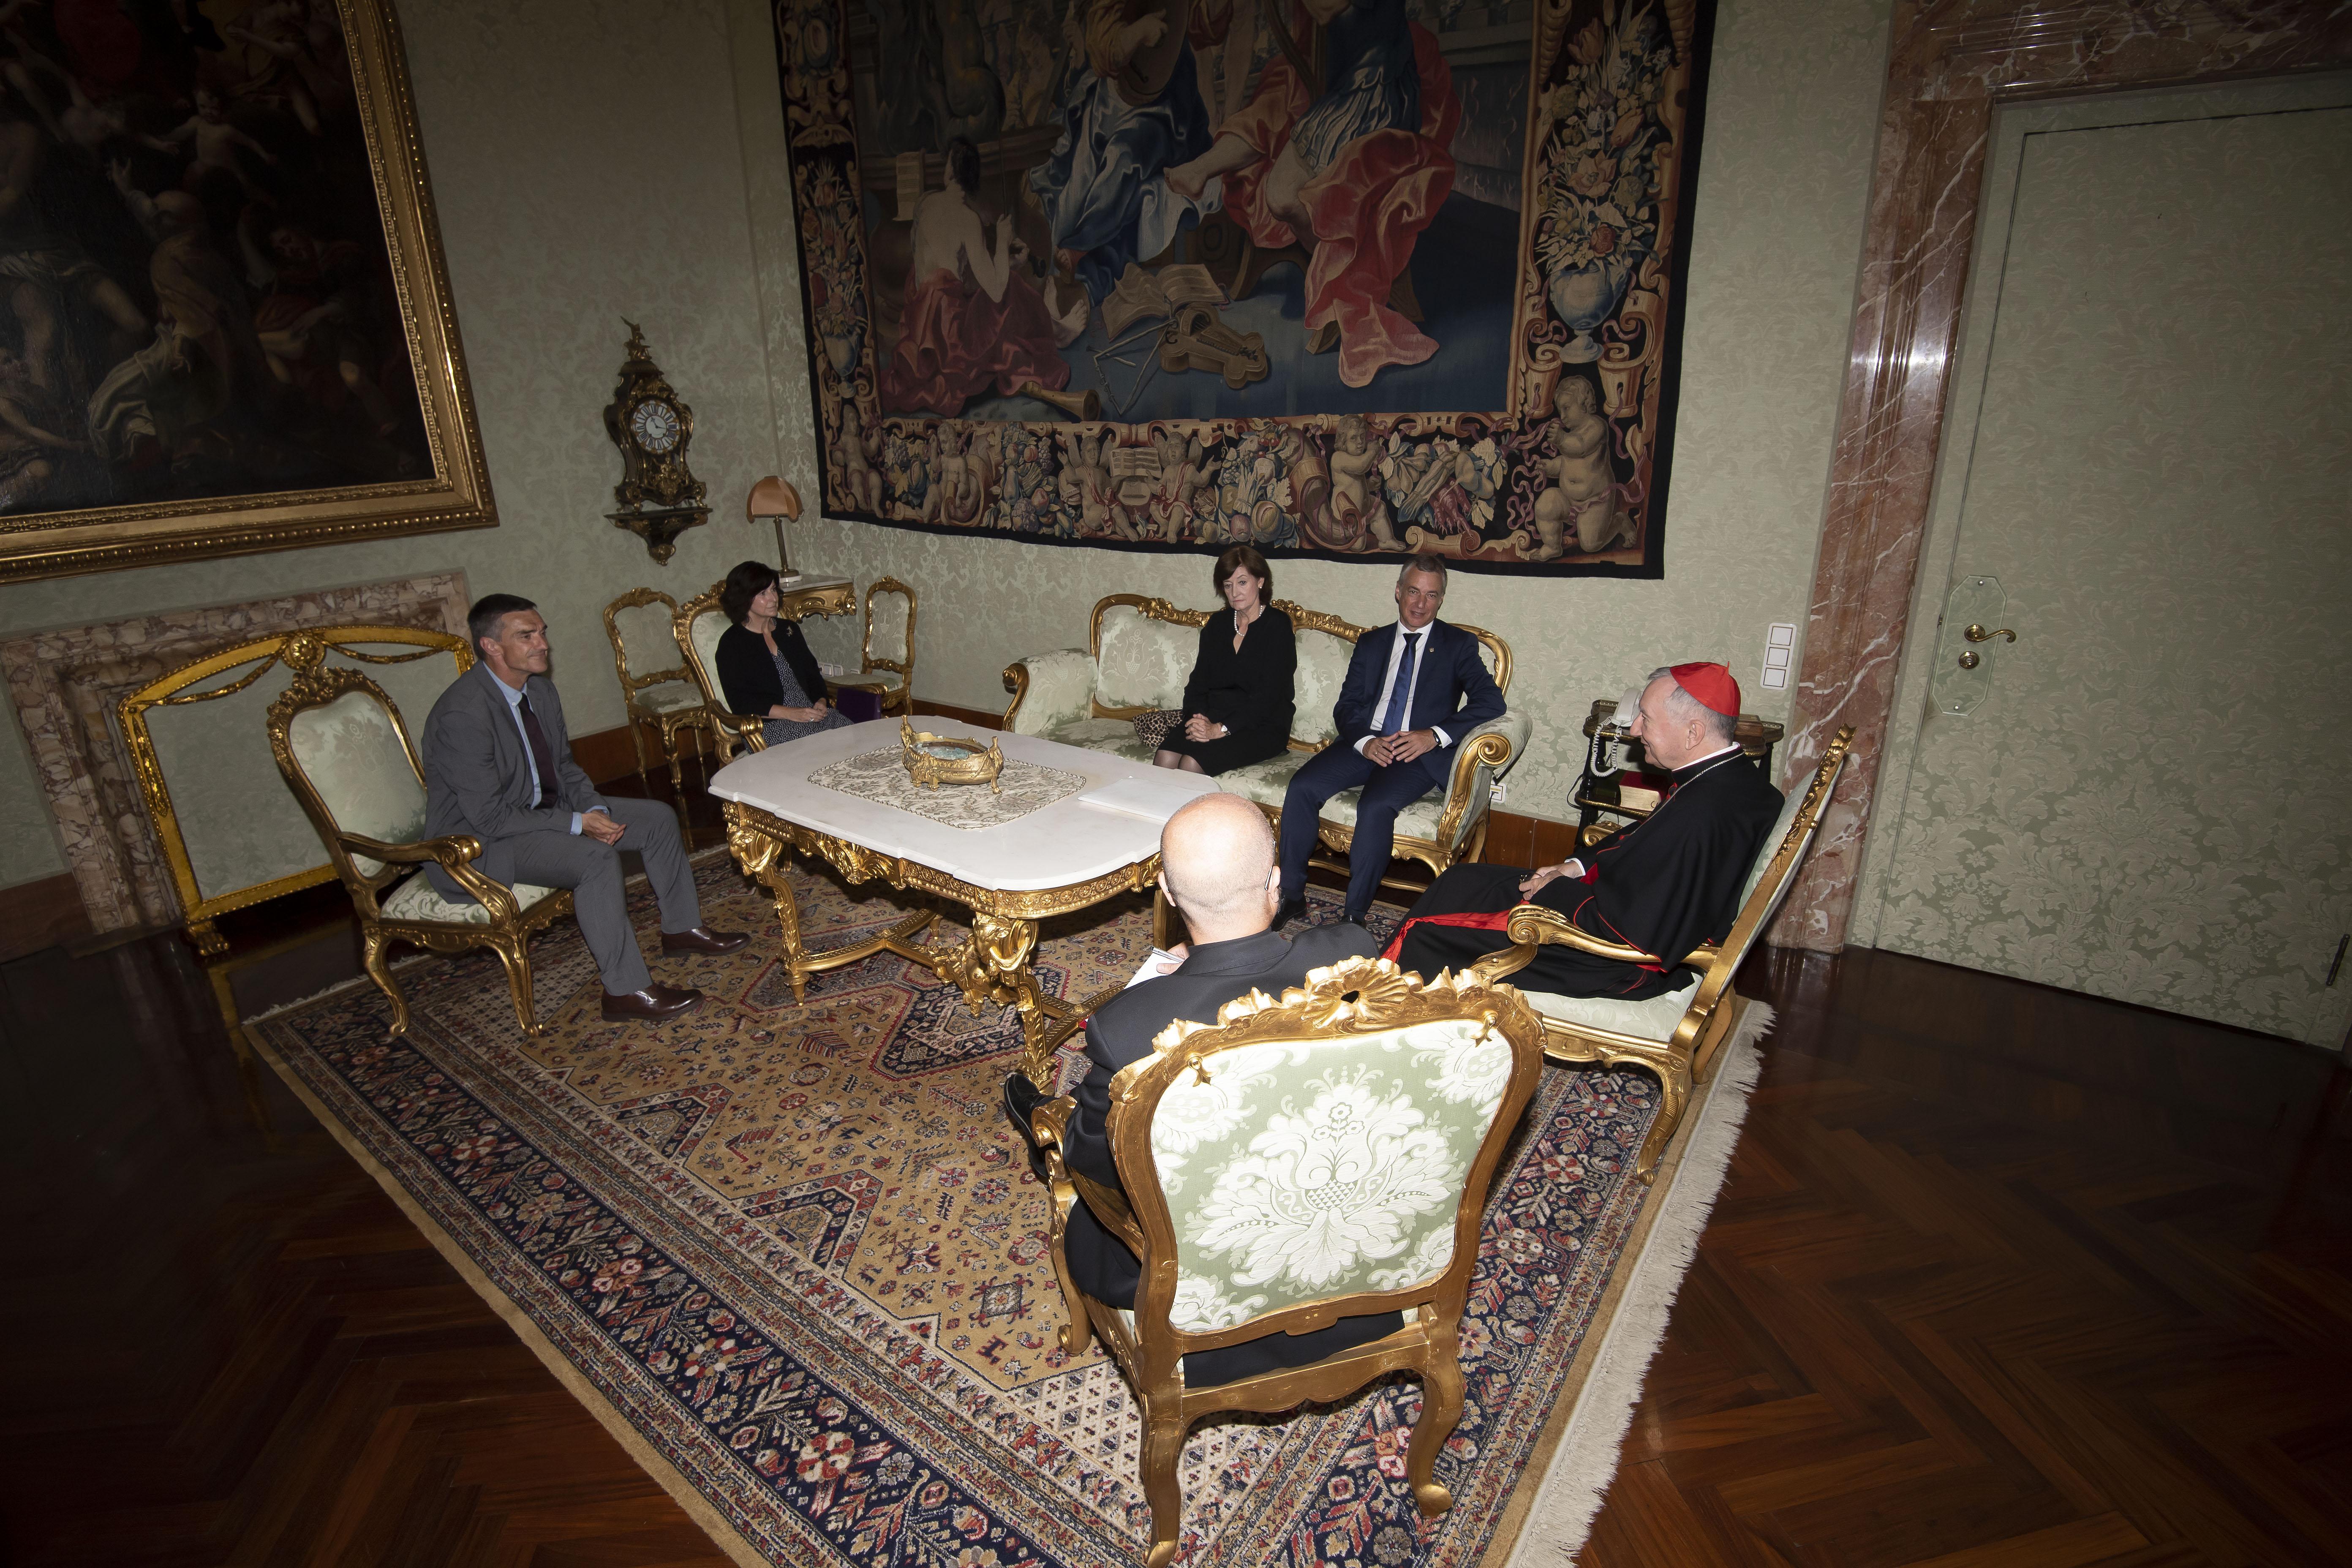 2019_08_28_lhk_secretario_estado_vaticano_04.jpg